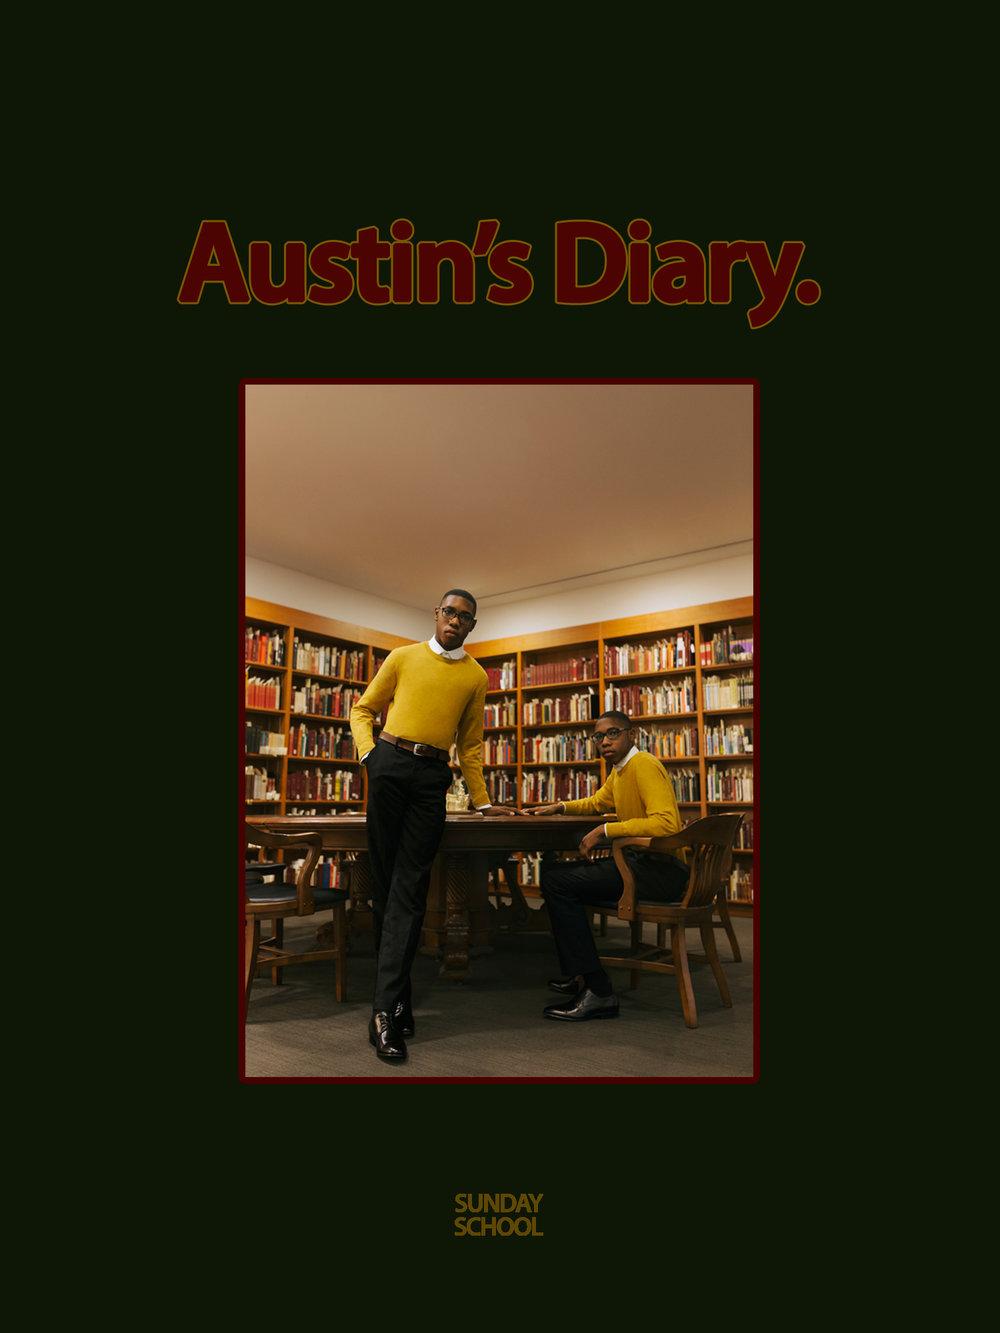 austinsdiary.jpg